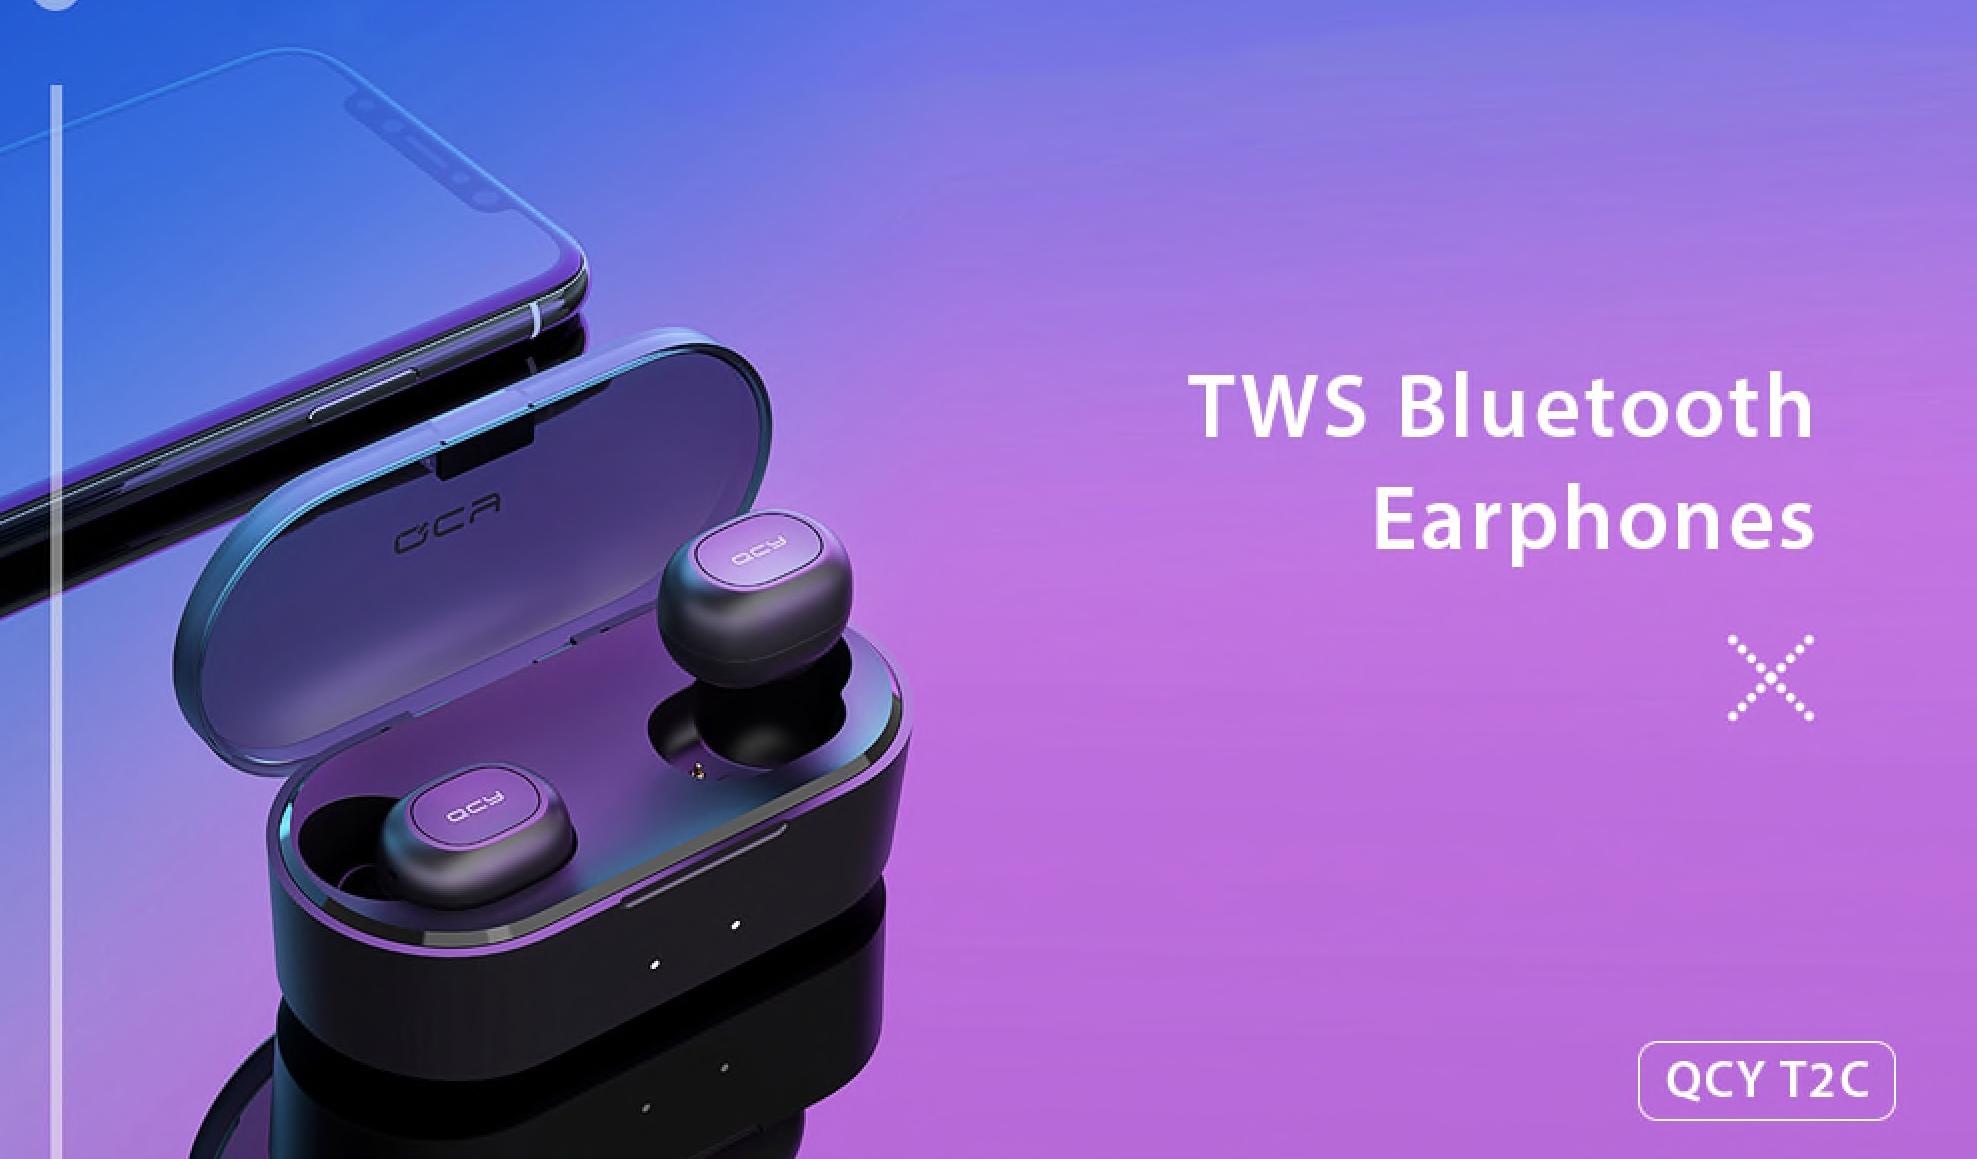 Bezdrátová sluchátka QCY T2C za skvělou cenu na e-shopu Cafago.com [Sponzorovaný článek)